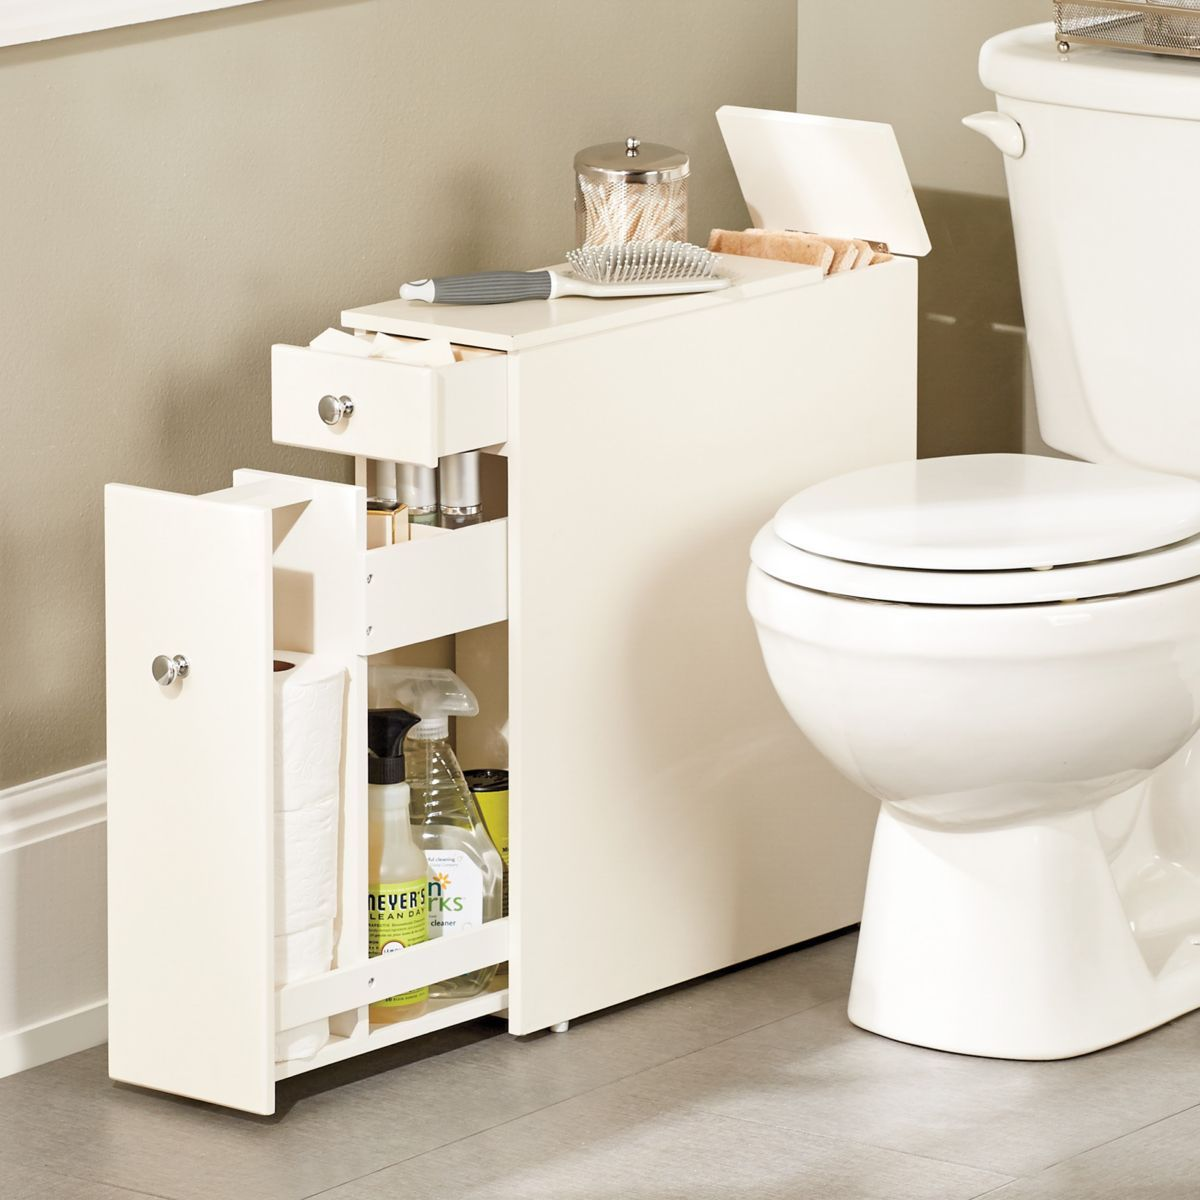 Bainbridge Slim Bath Cabinet   Bathroom ideas   Pinterest   Bath ...